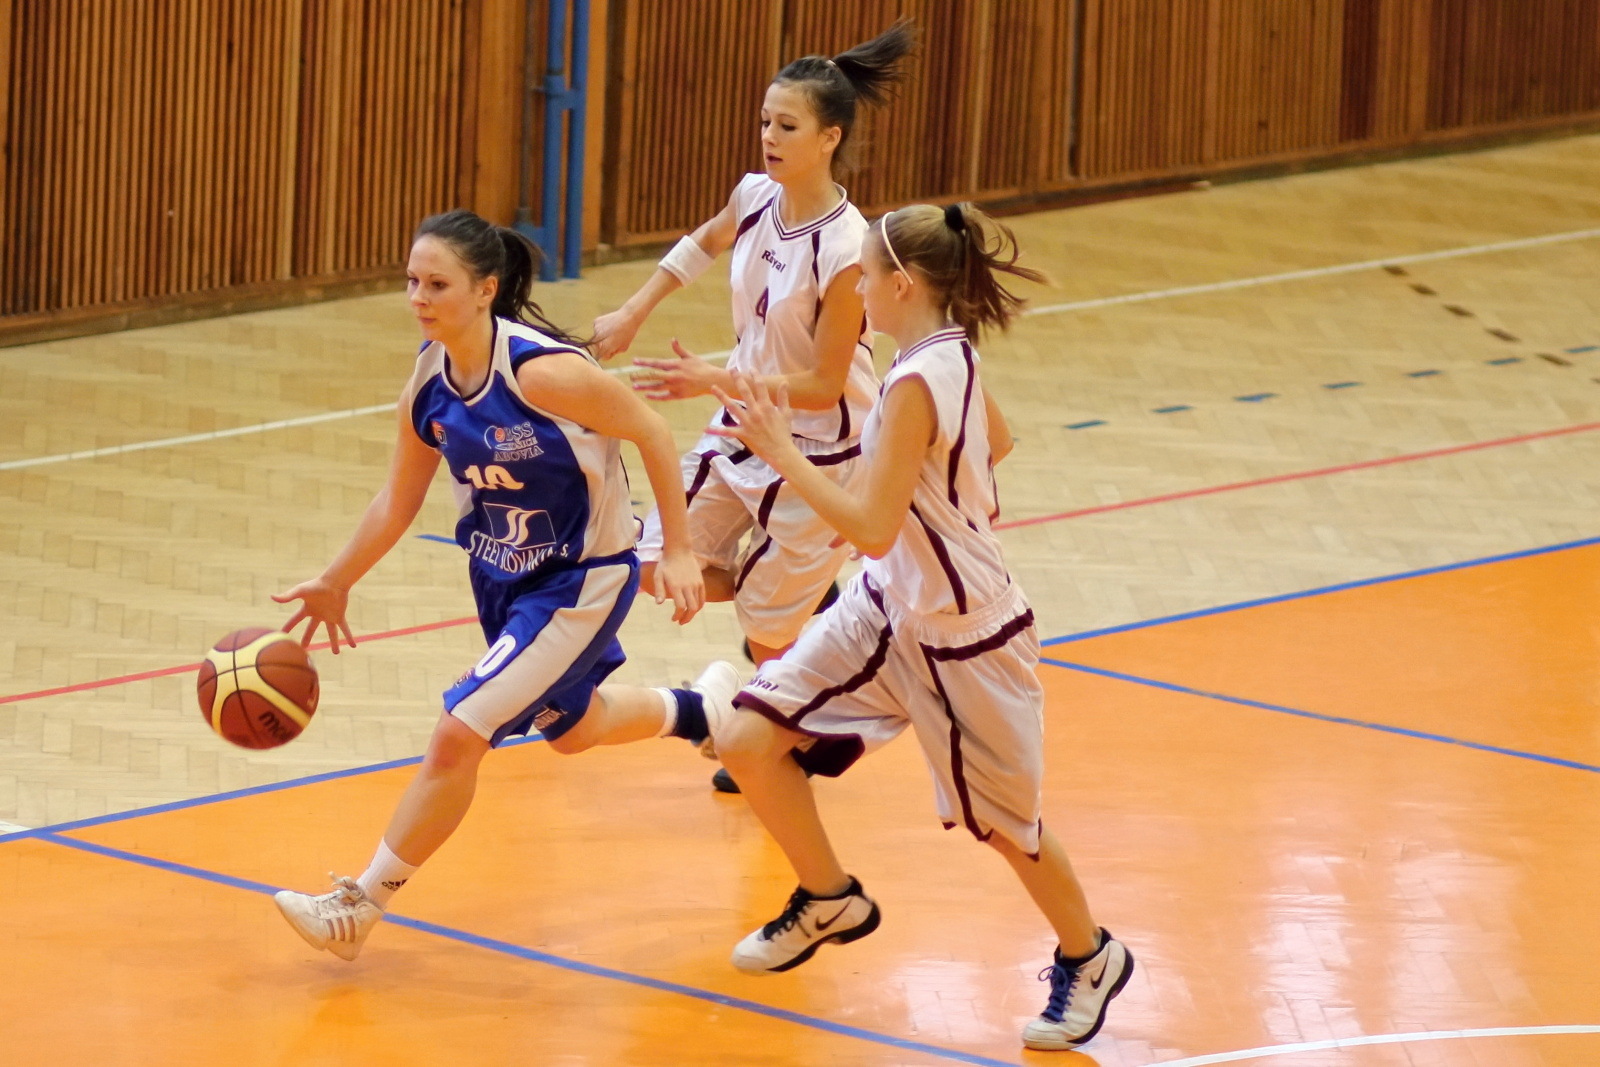 bk-zvolen-abovia-kosice-ziacky-basketbal-2011-8